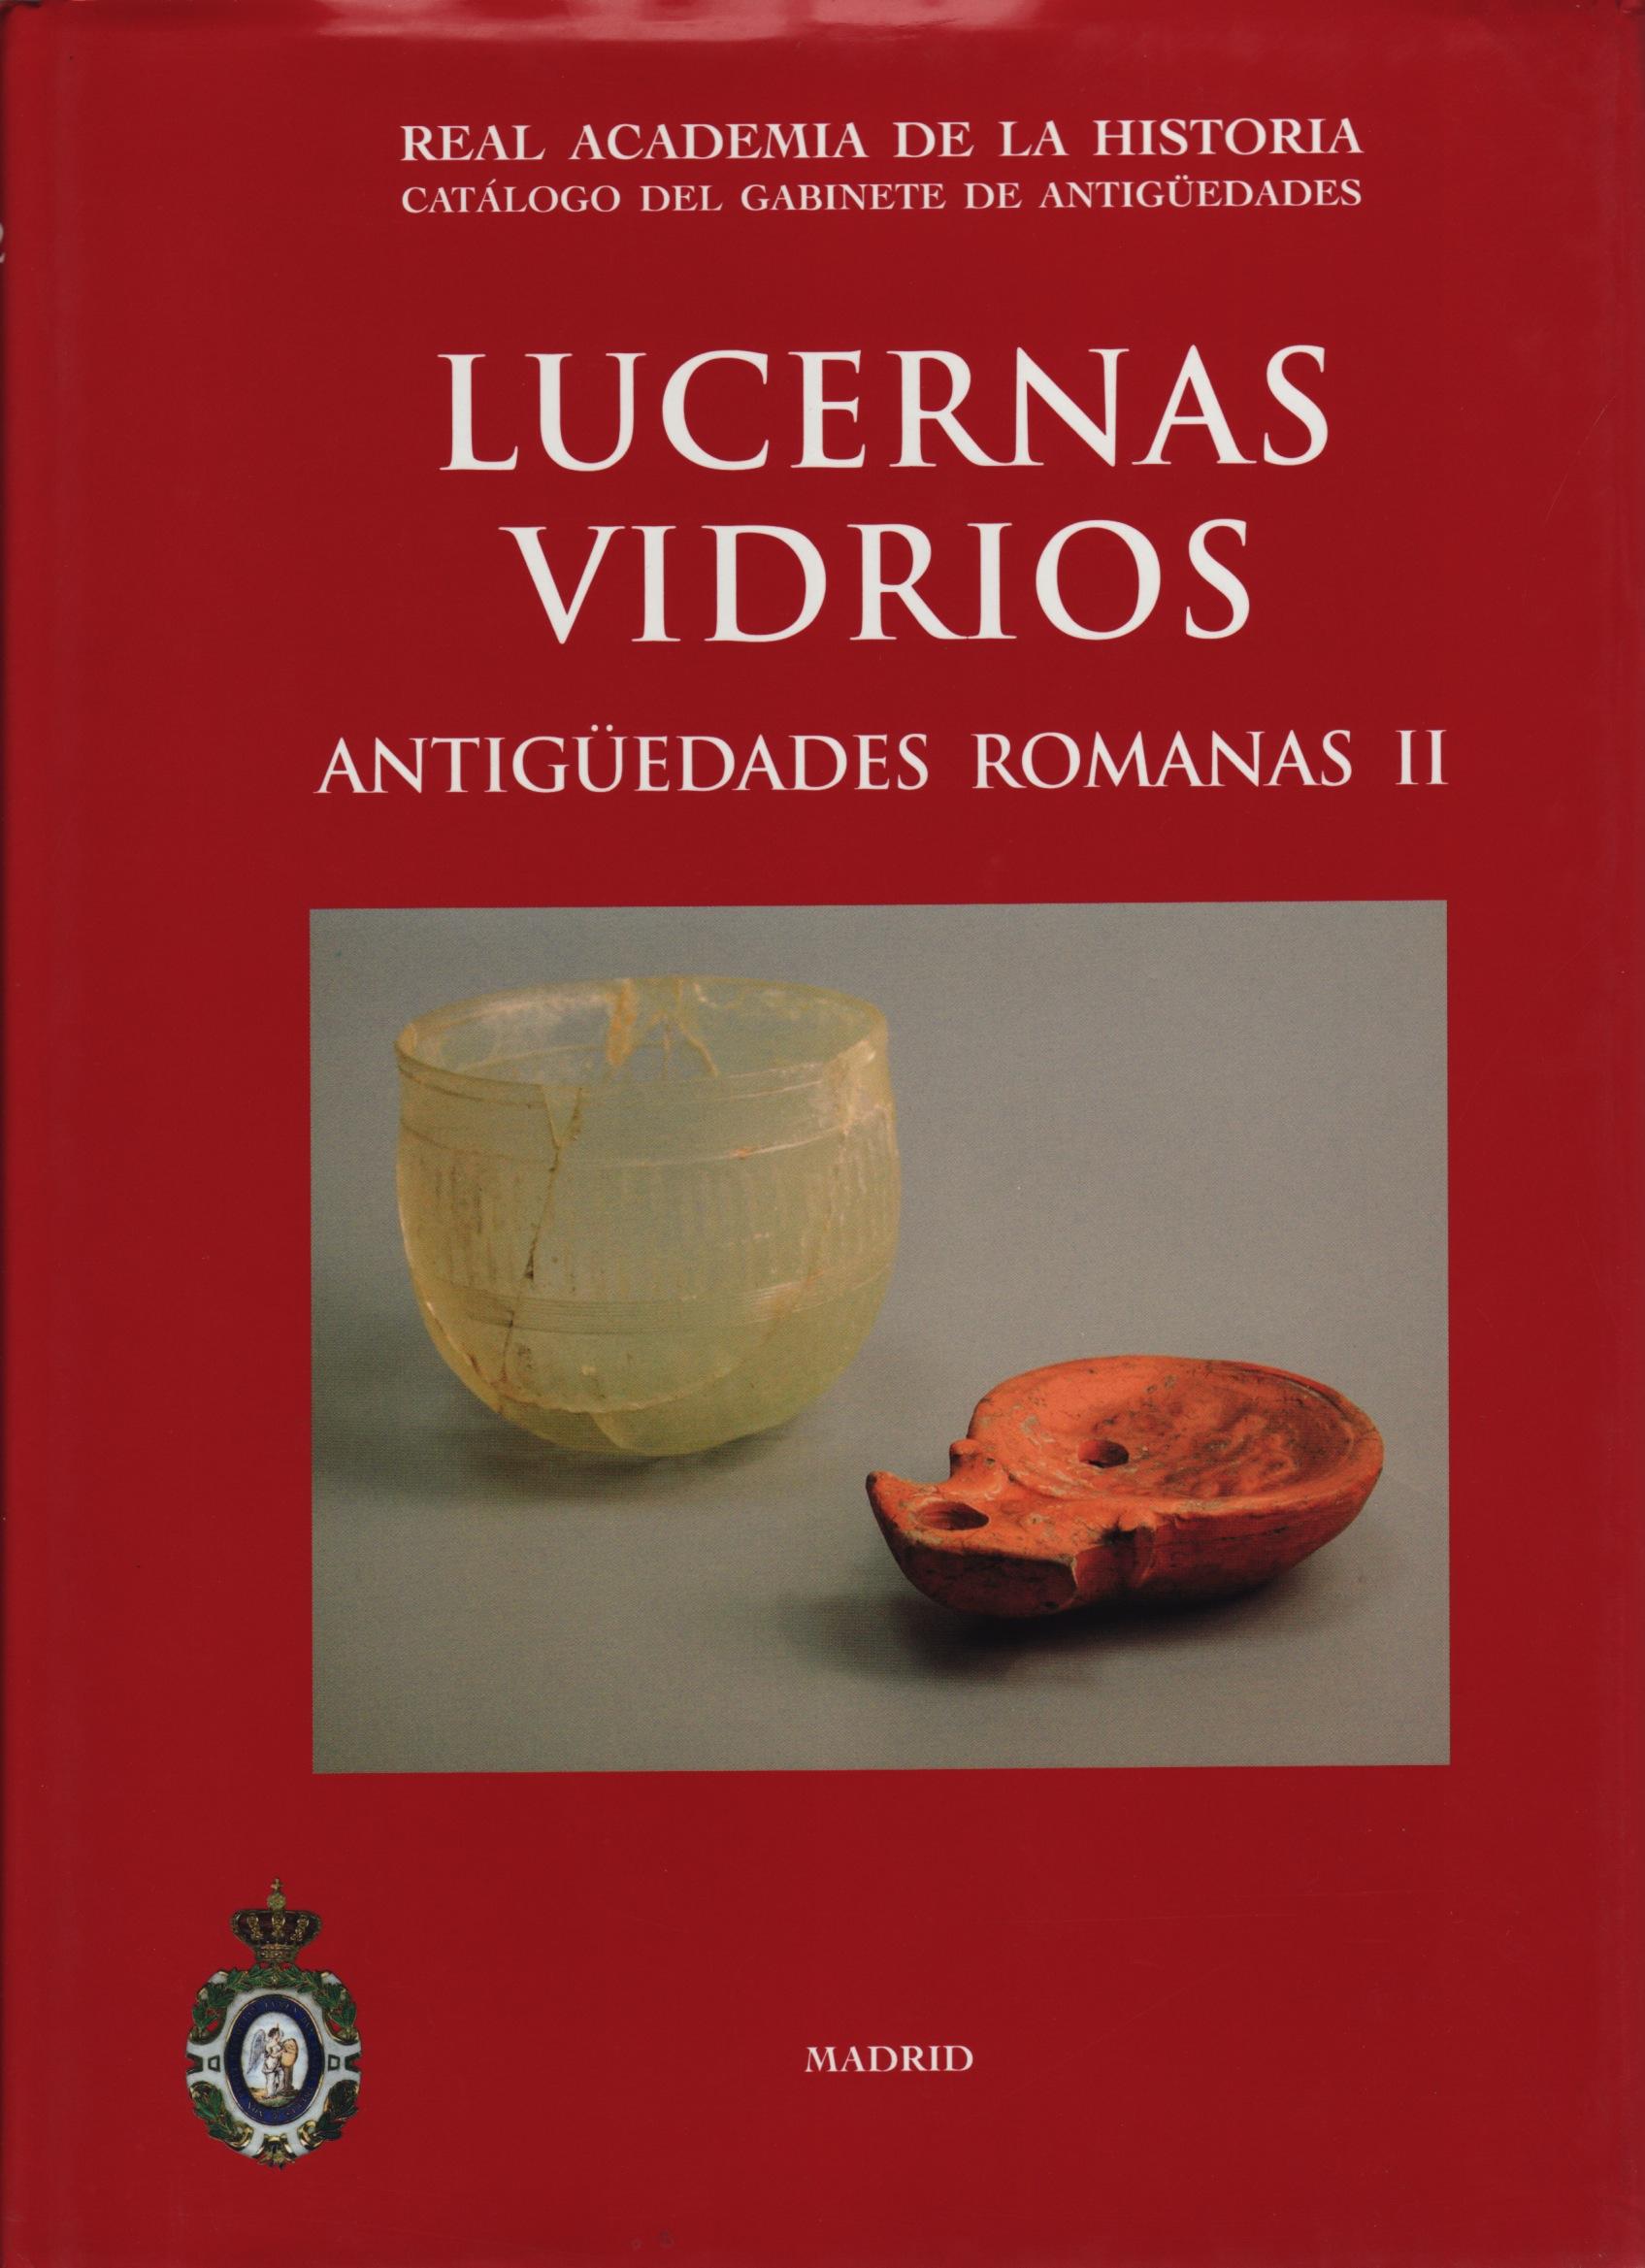 real academia de historia 2005